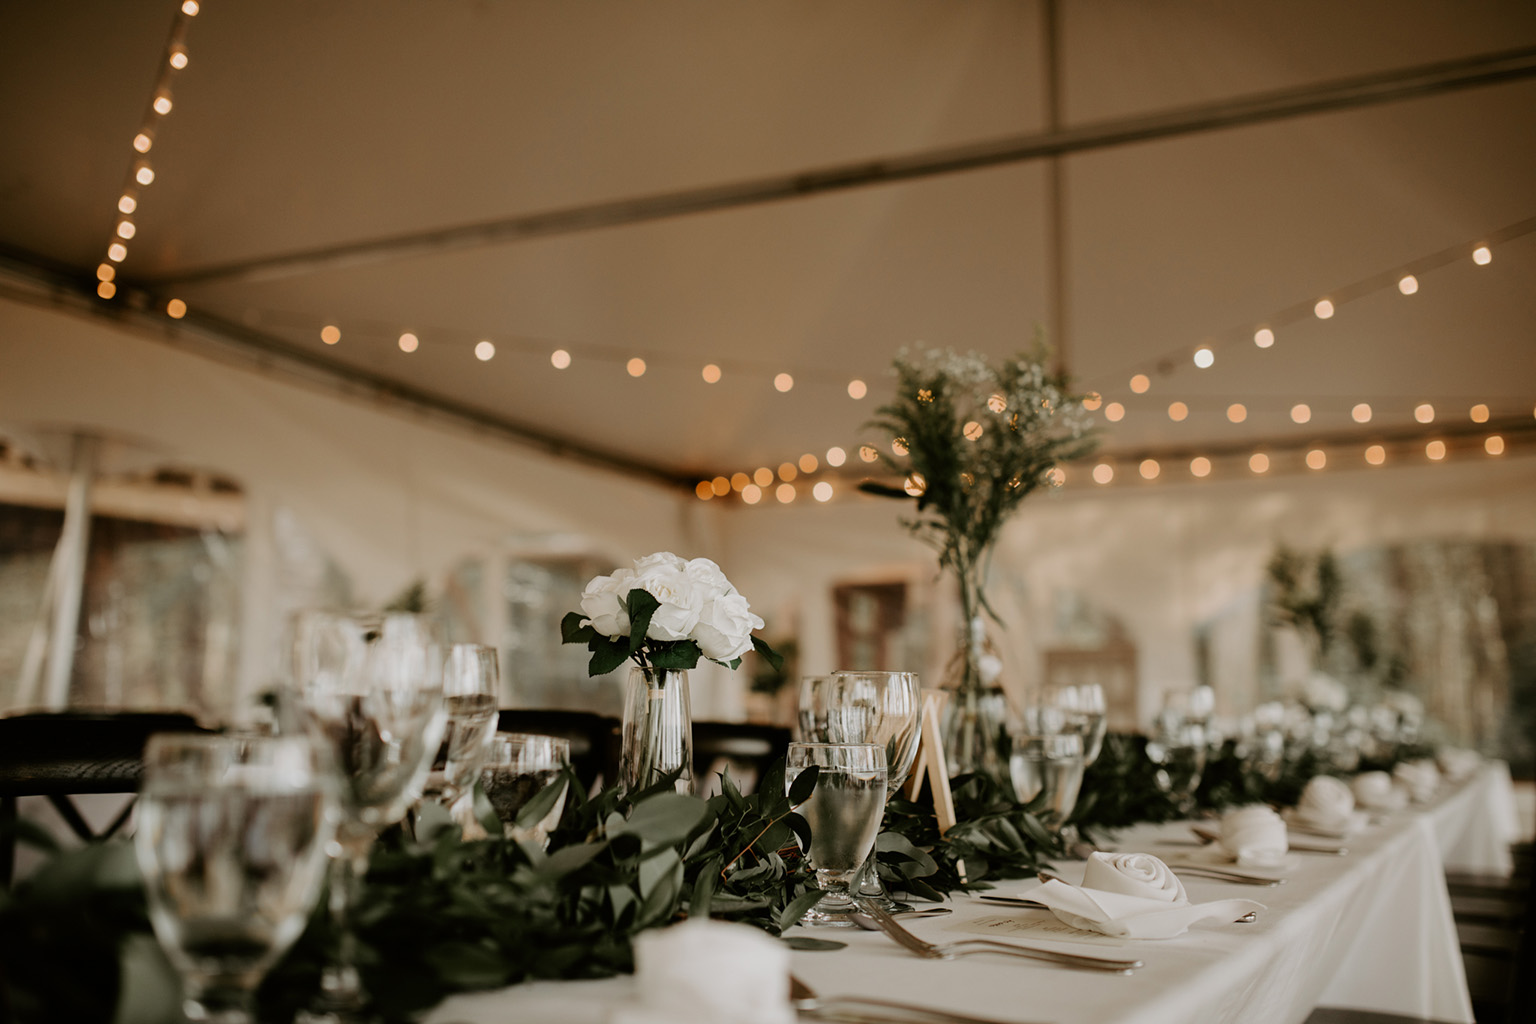 Serenity Cottage Wedding - reception decor